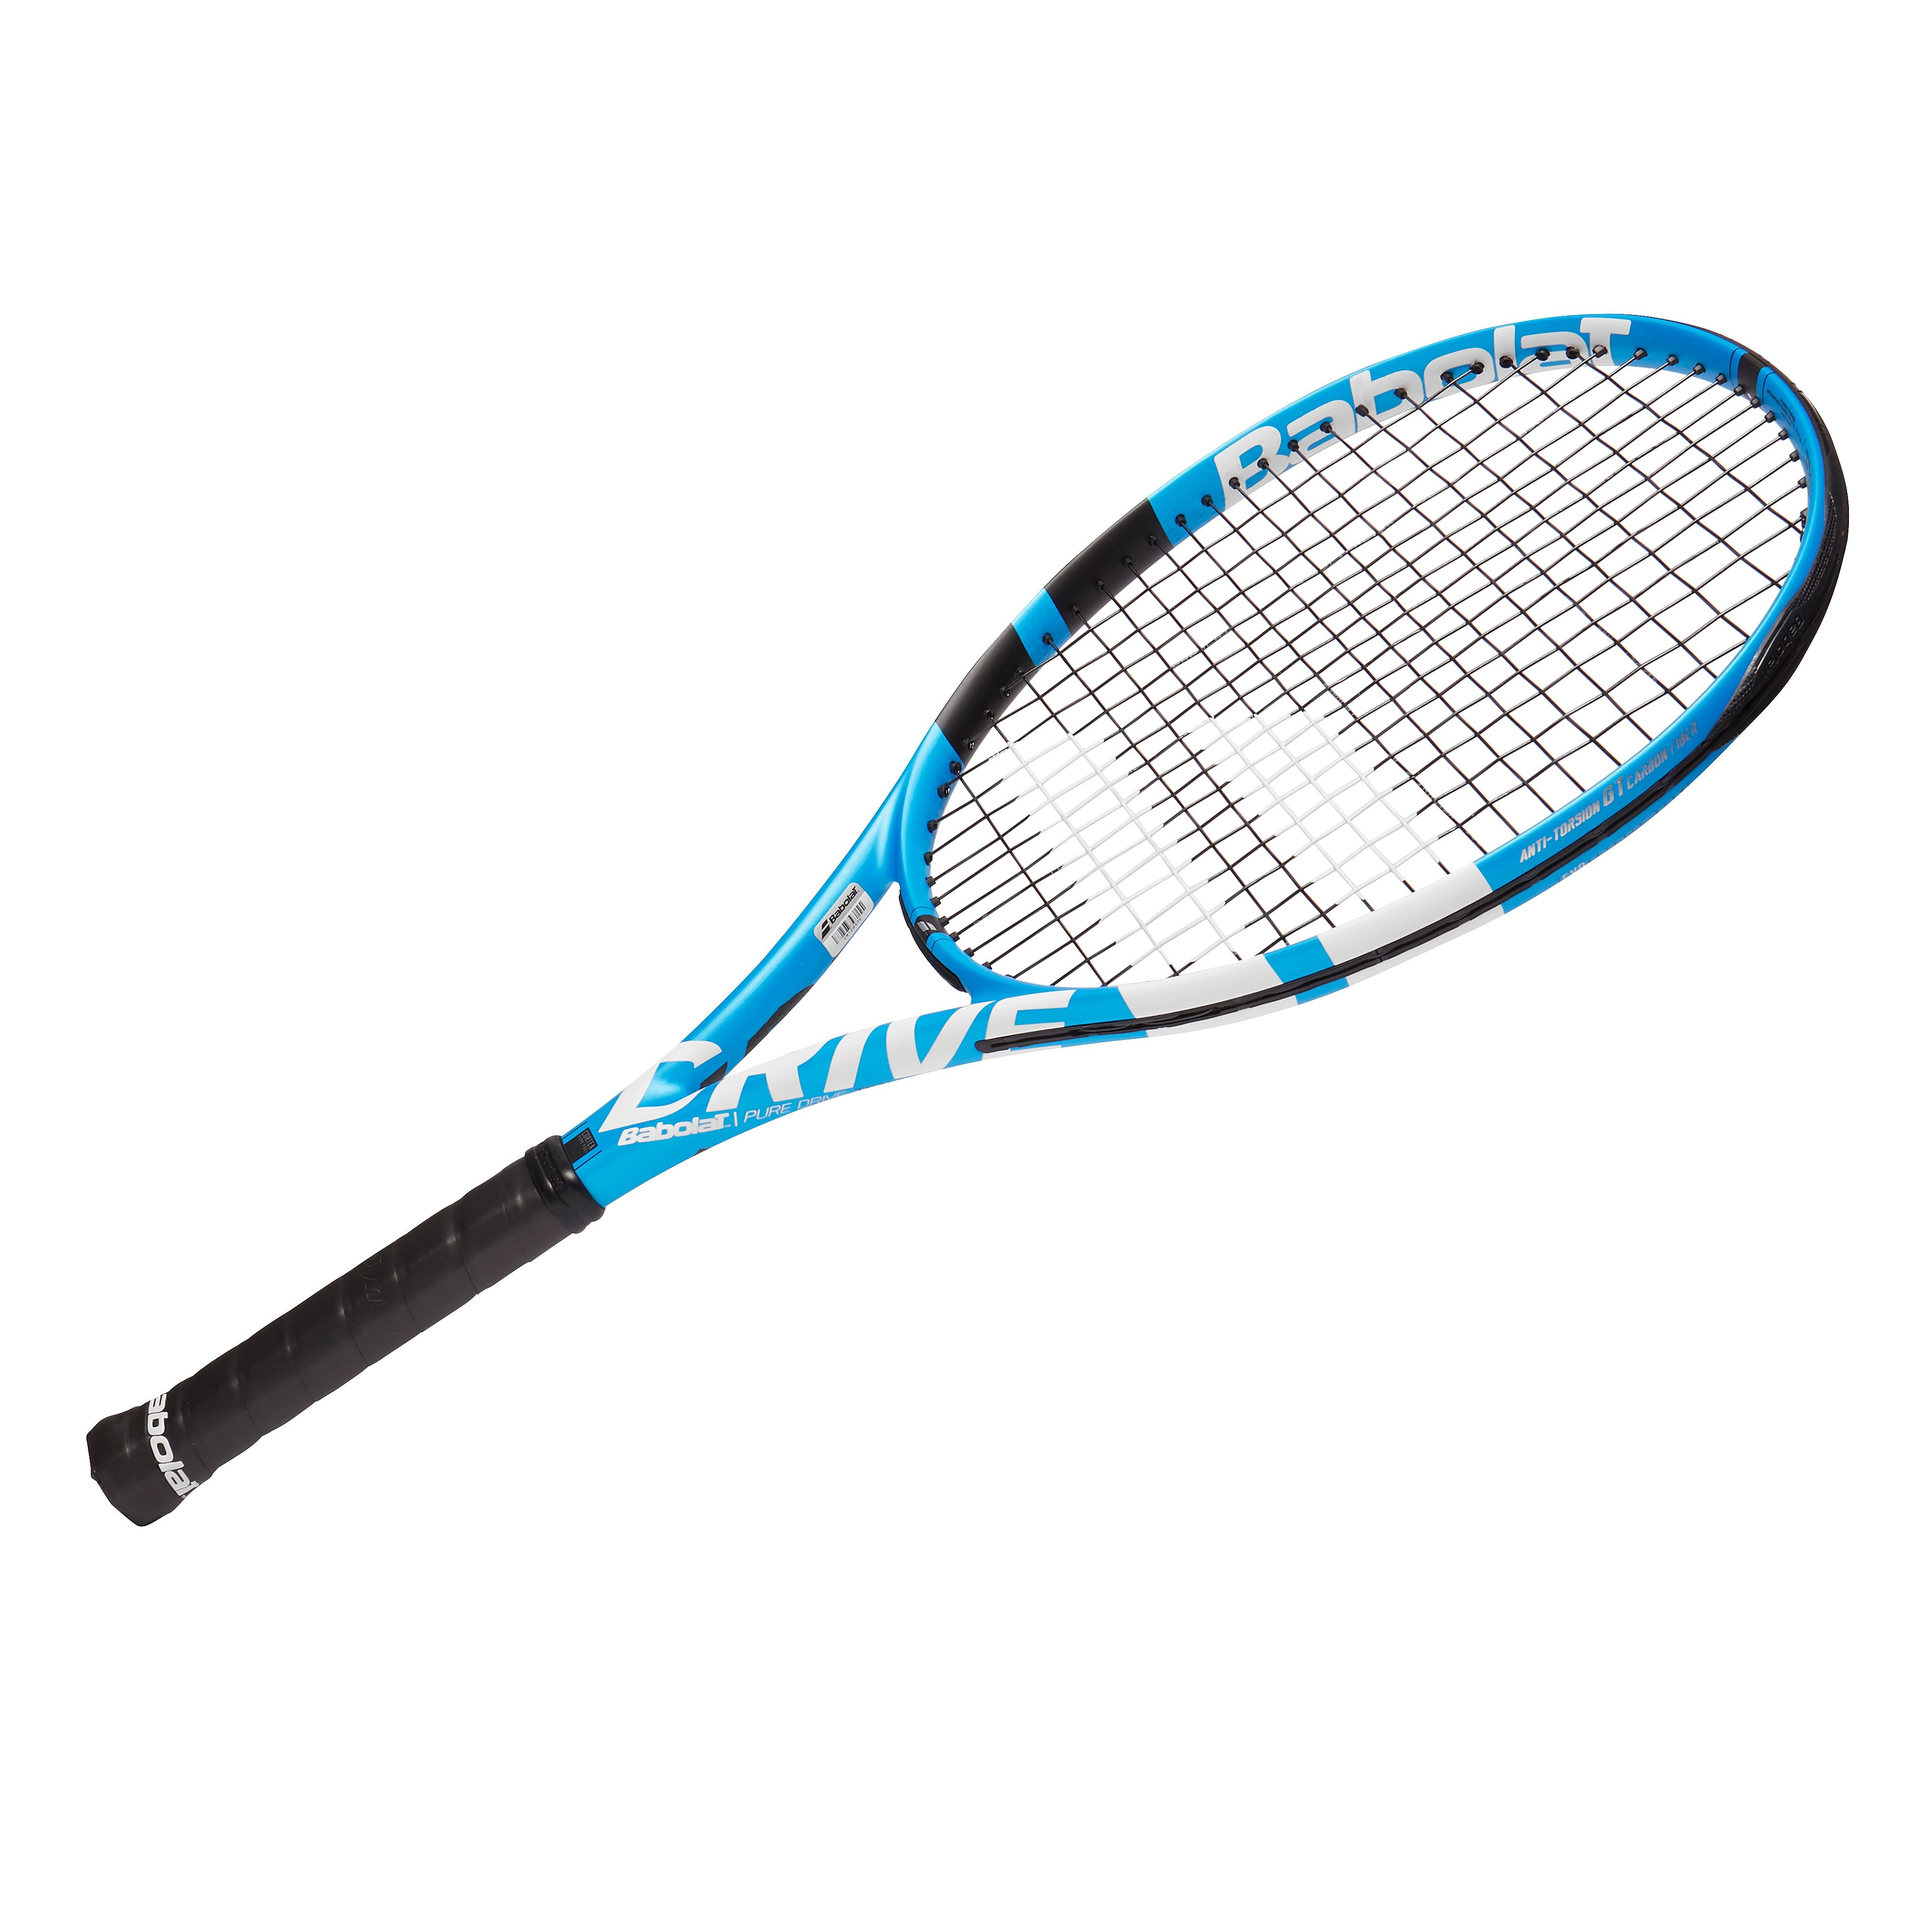 Babolat Pure Drive Team Tennis Racket